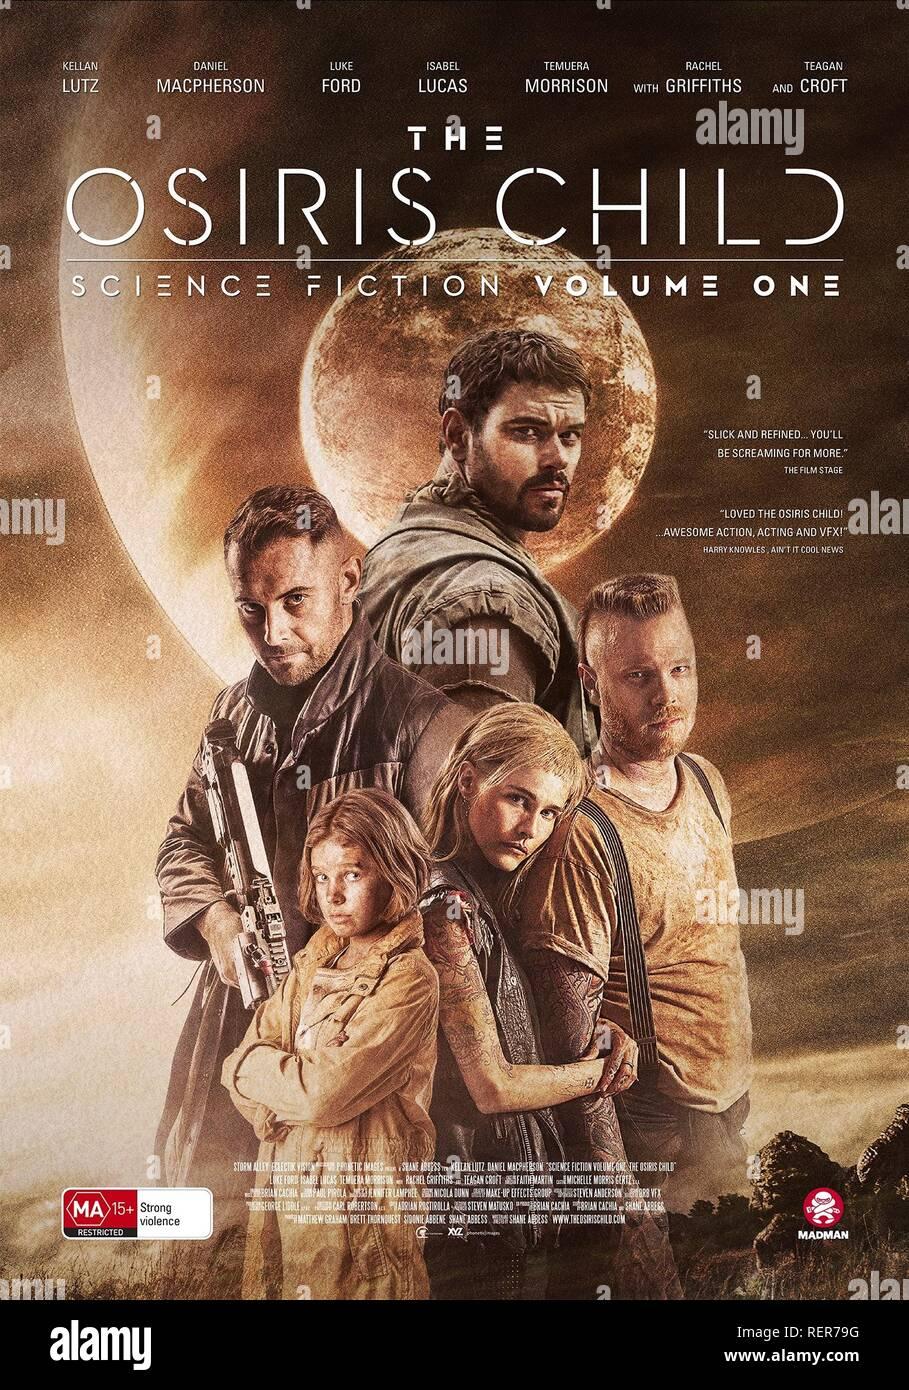 ee1efcec98 DANIEL MACPHERSON KELLAN LUTZ TEAGAN CROFT ISABEL LUCAS & LUKE FORD POSTER SCIENCE  FICTION VOLUME ONE: THE OSIRIS CHILD (2016